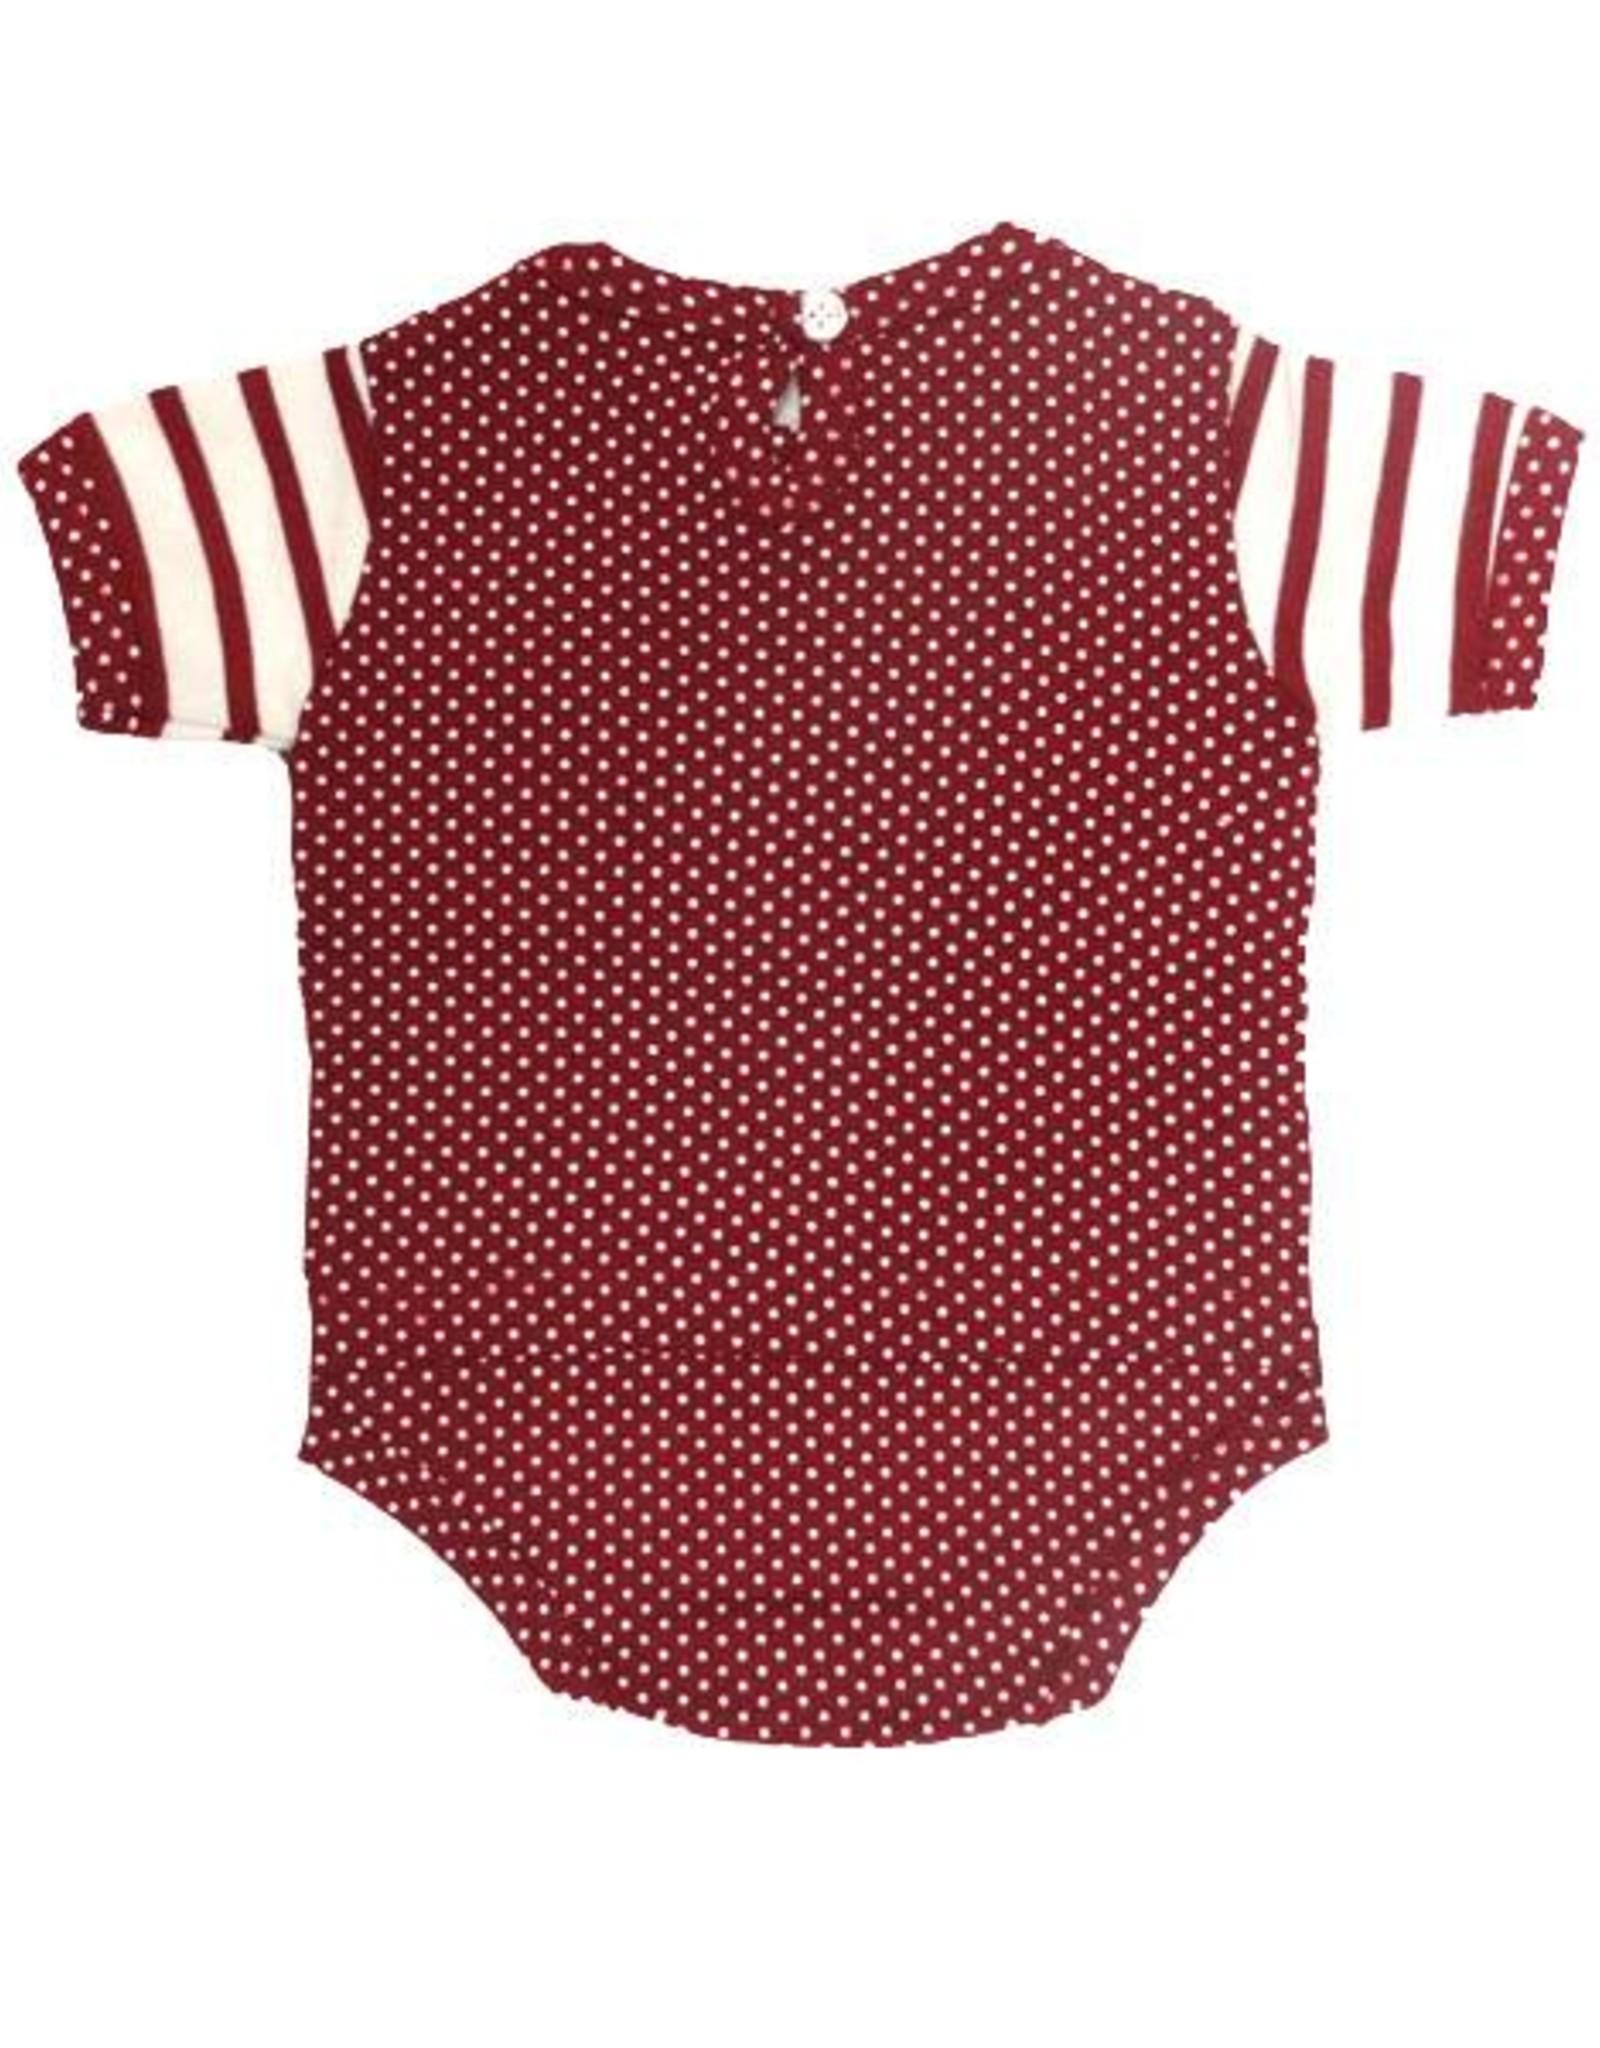 Two Feet Ahead Infant Two Feet Ahead Stripe & Pin Dot Layered Creeper Crimson & White